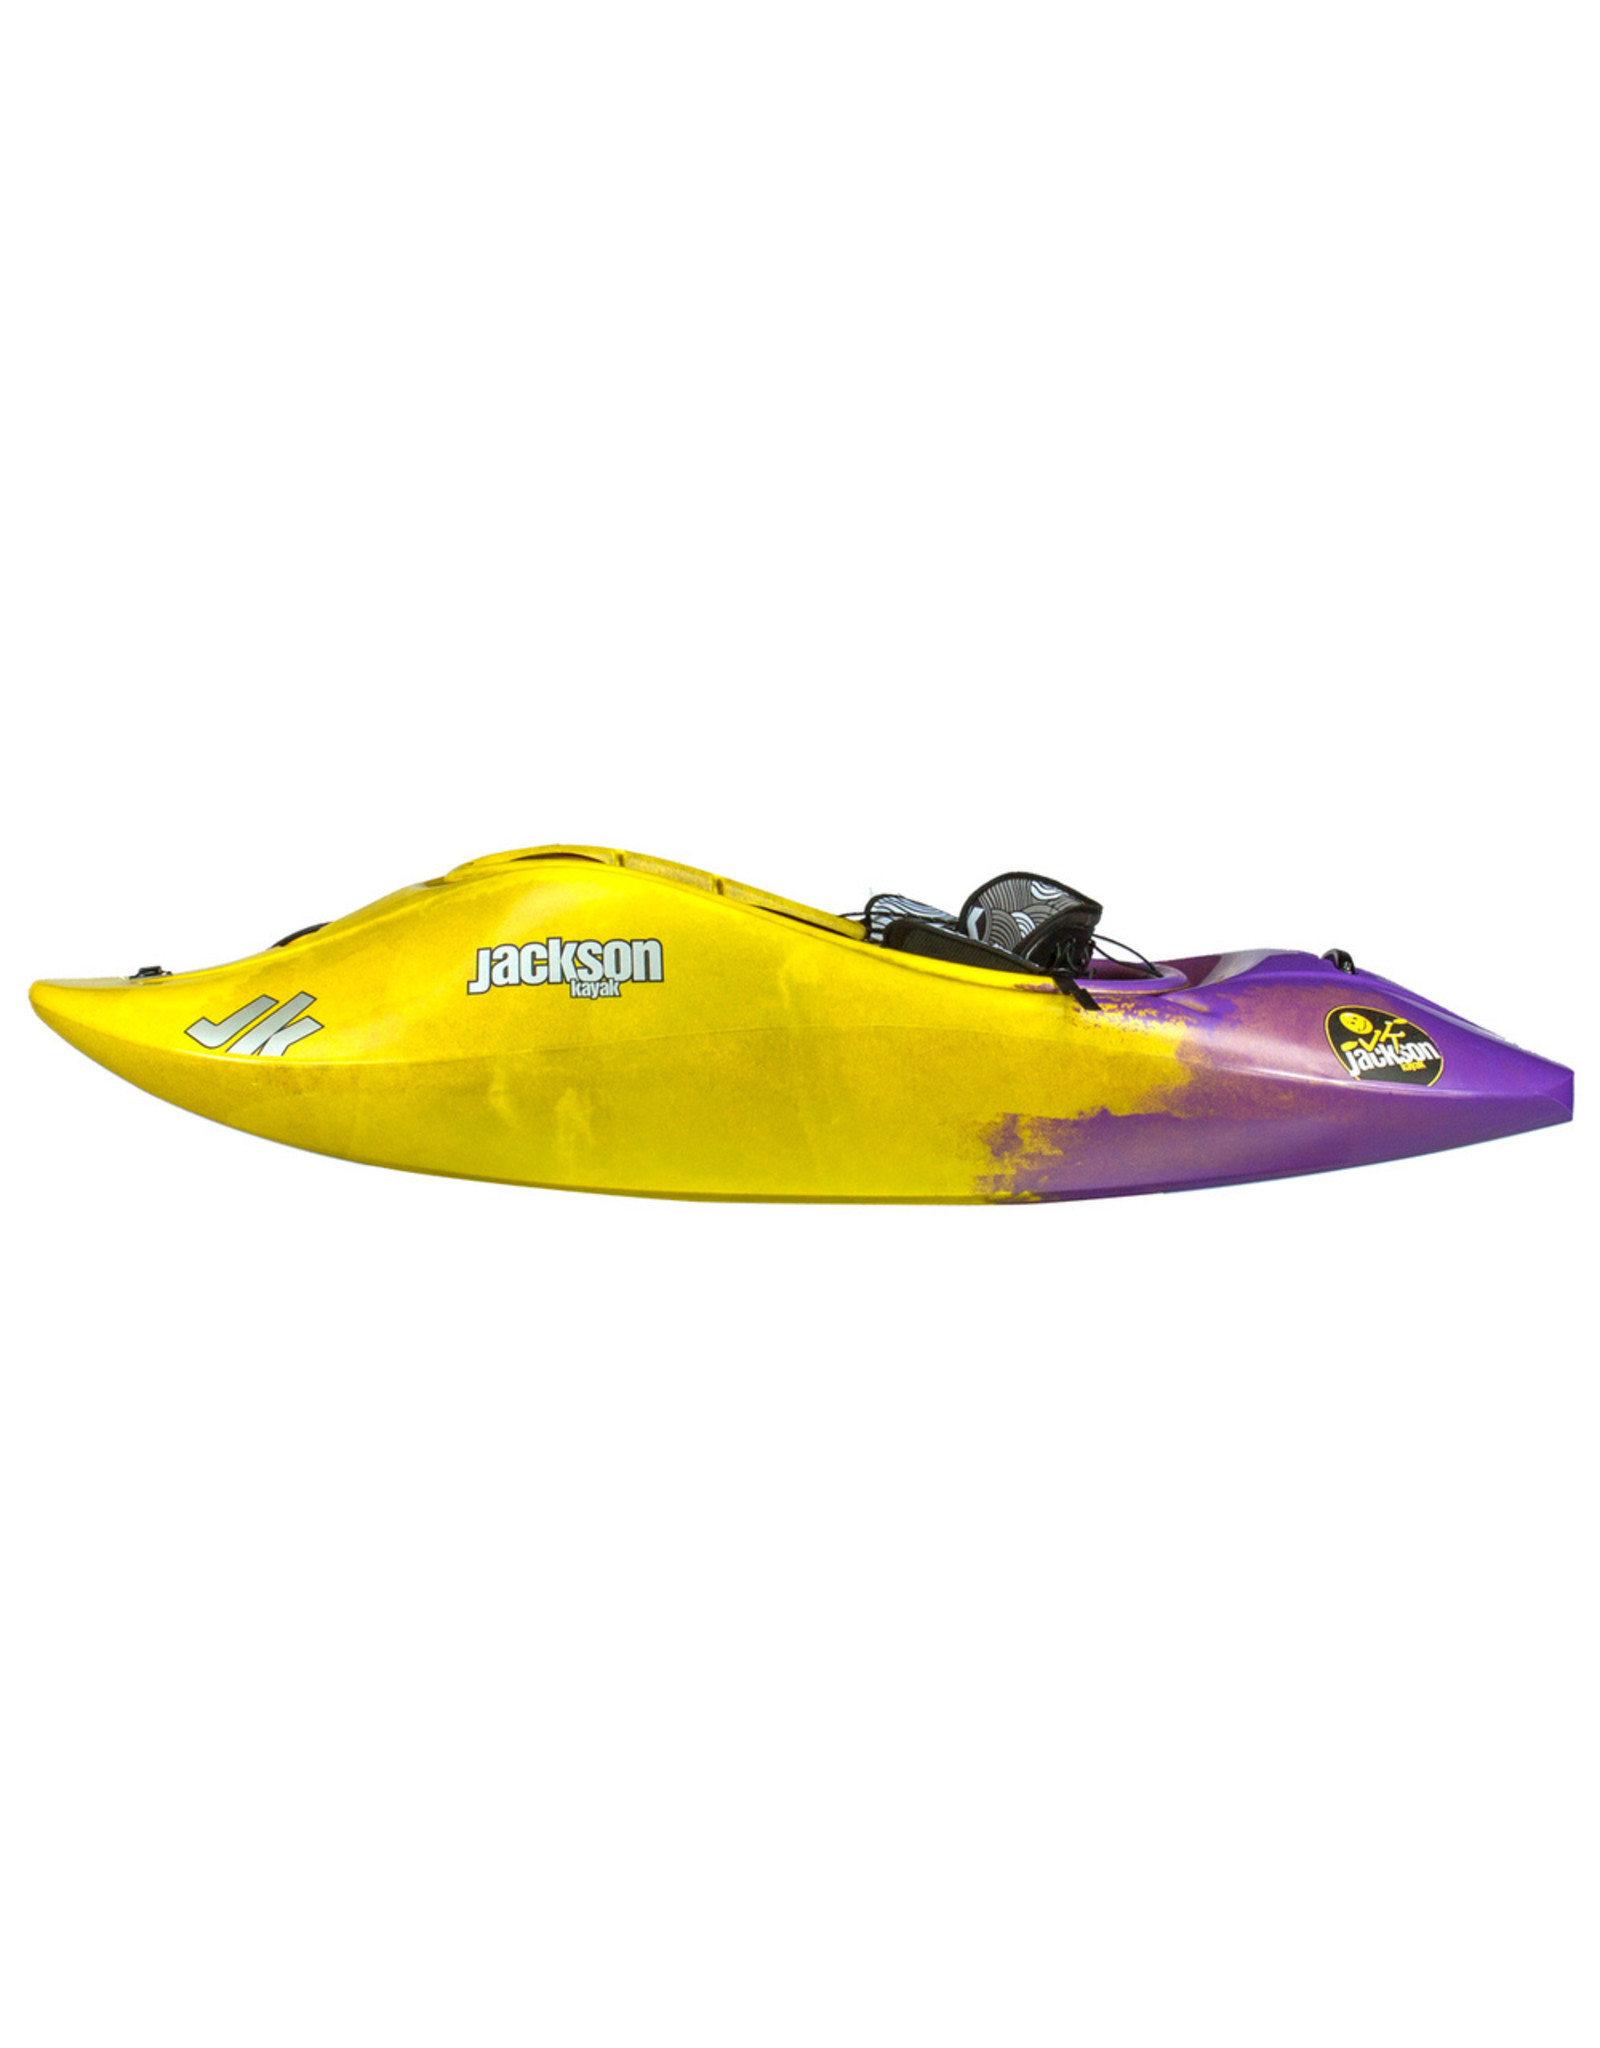 Jackson Kayak Jackson Rockstar 4.0 2021